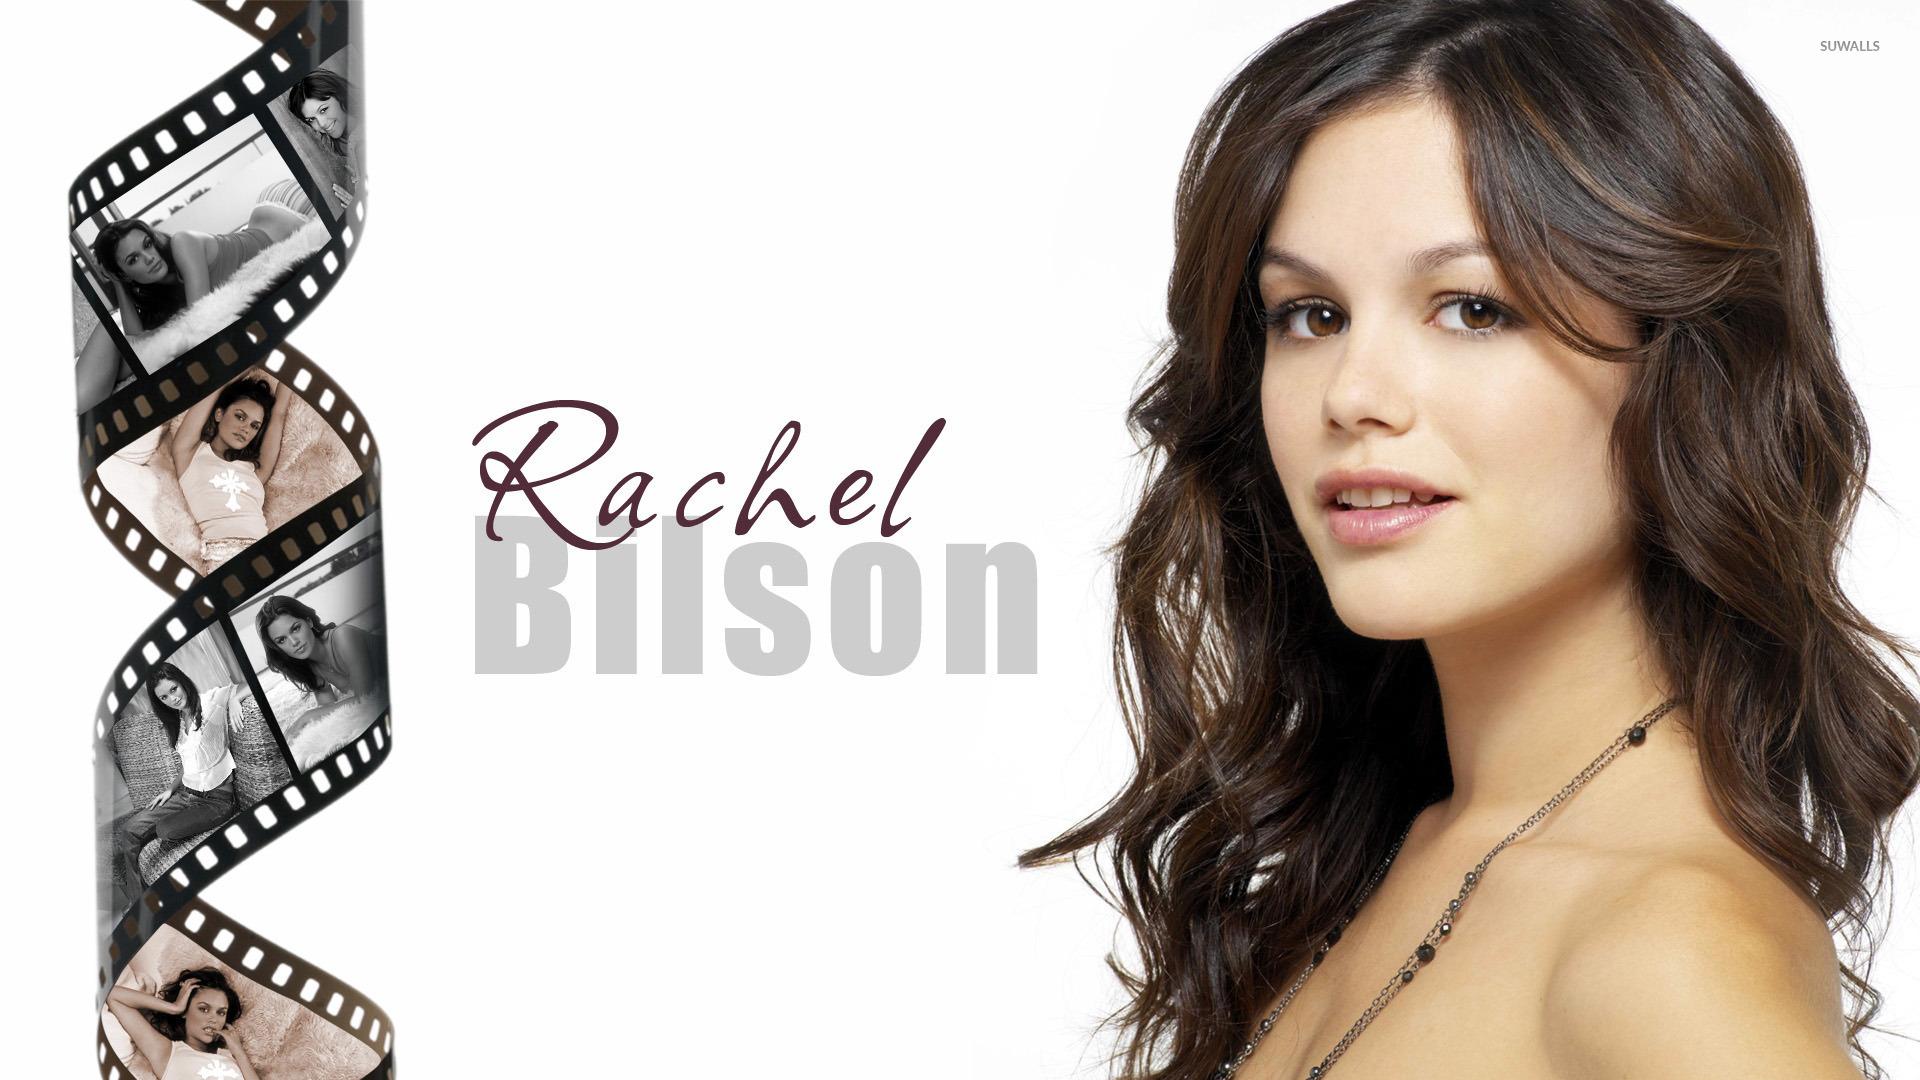 Rachel Bilson In Different Poses Wallpaper Celebrity Wallpapers